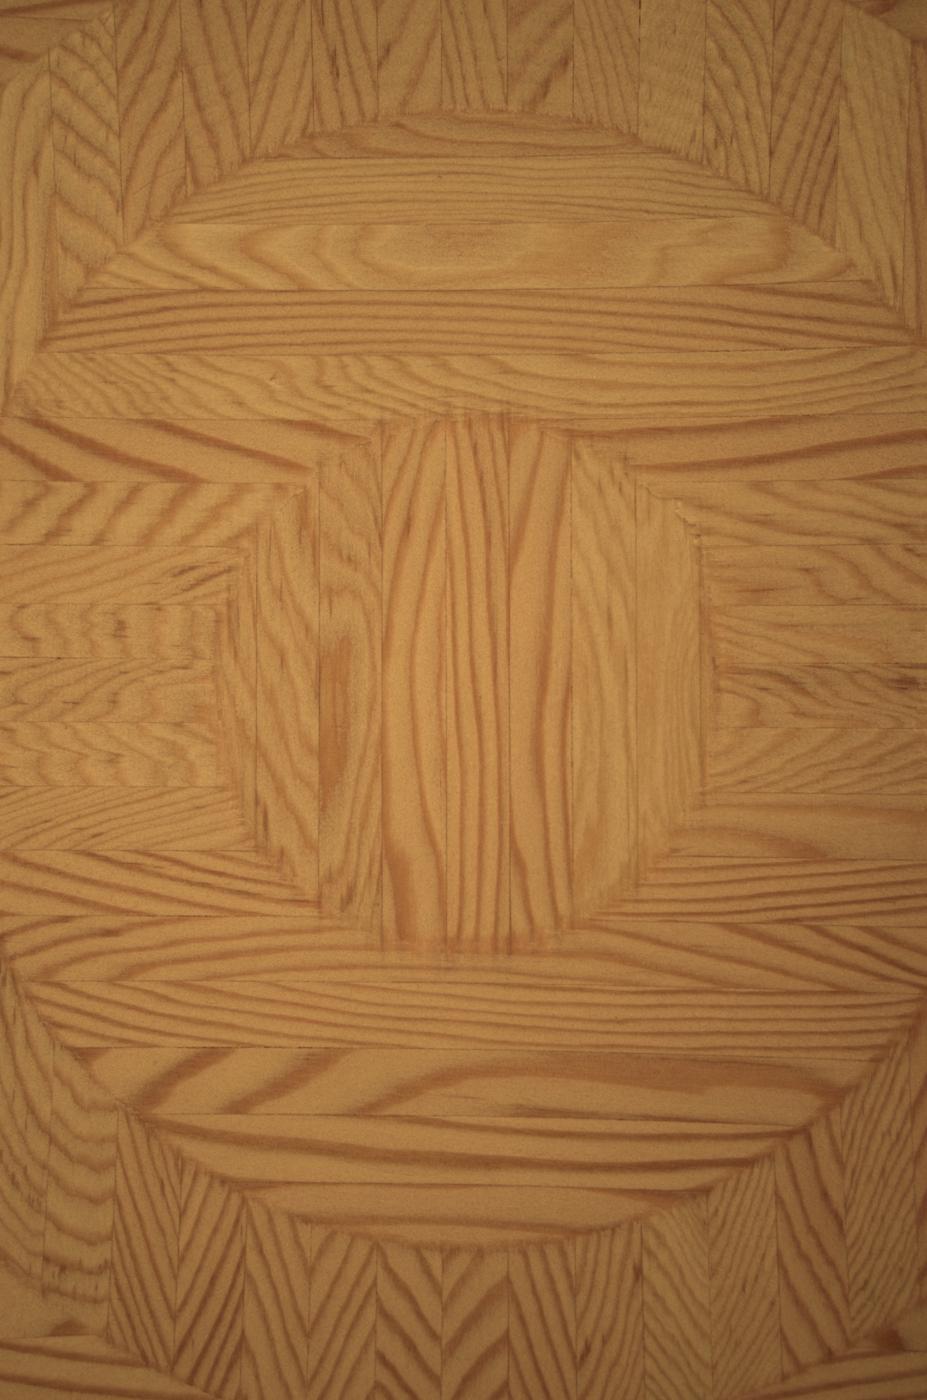 clt-timber-skin_6